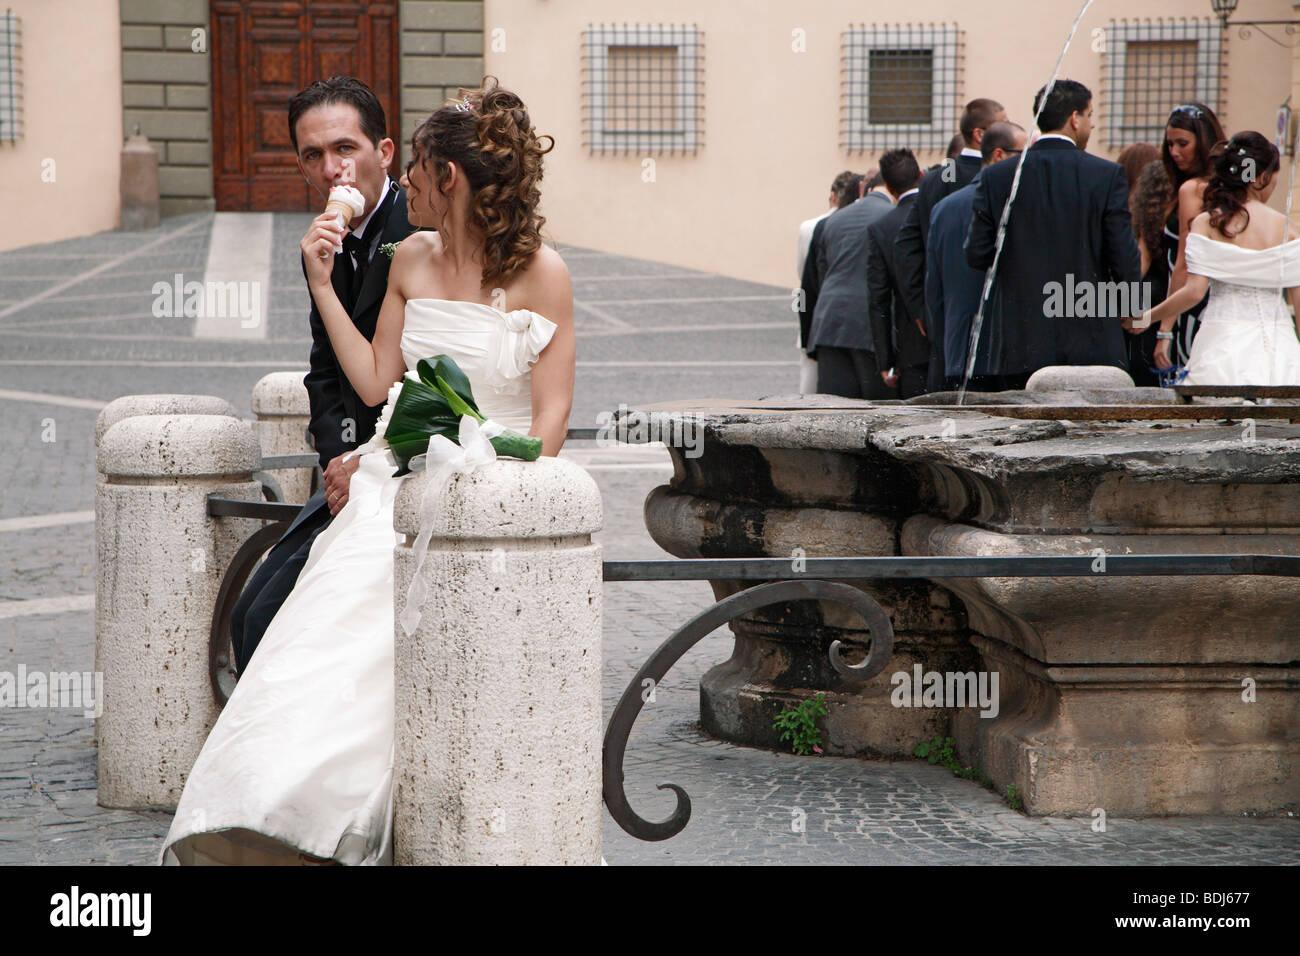 Bride feeding groom a gelato in the Piazza della Liberta, another wedding group in the background Castel Gandolfo, - Stock Image